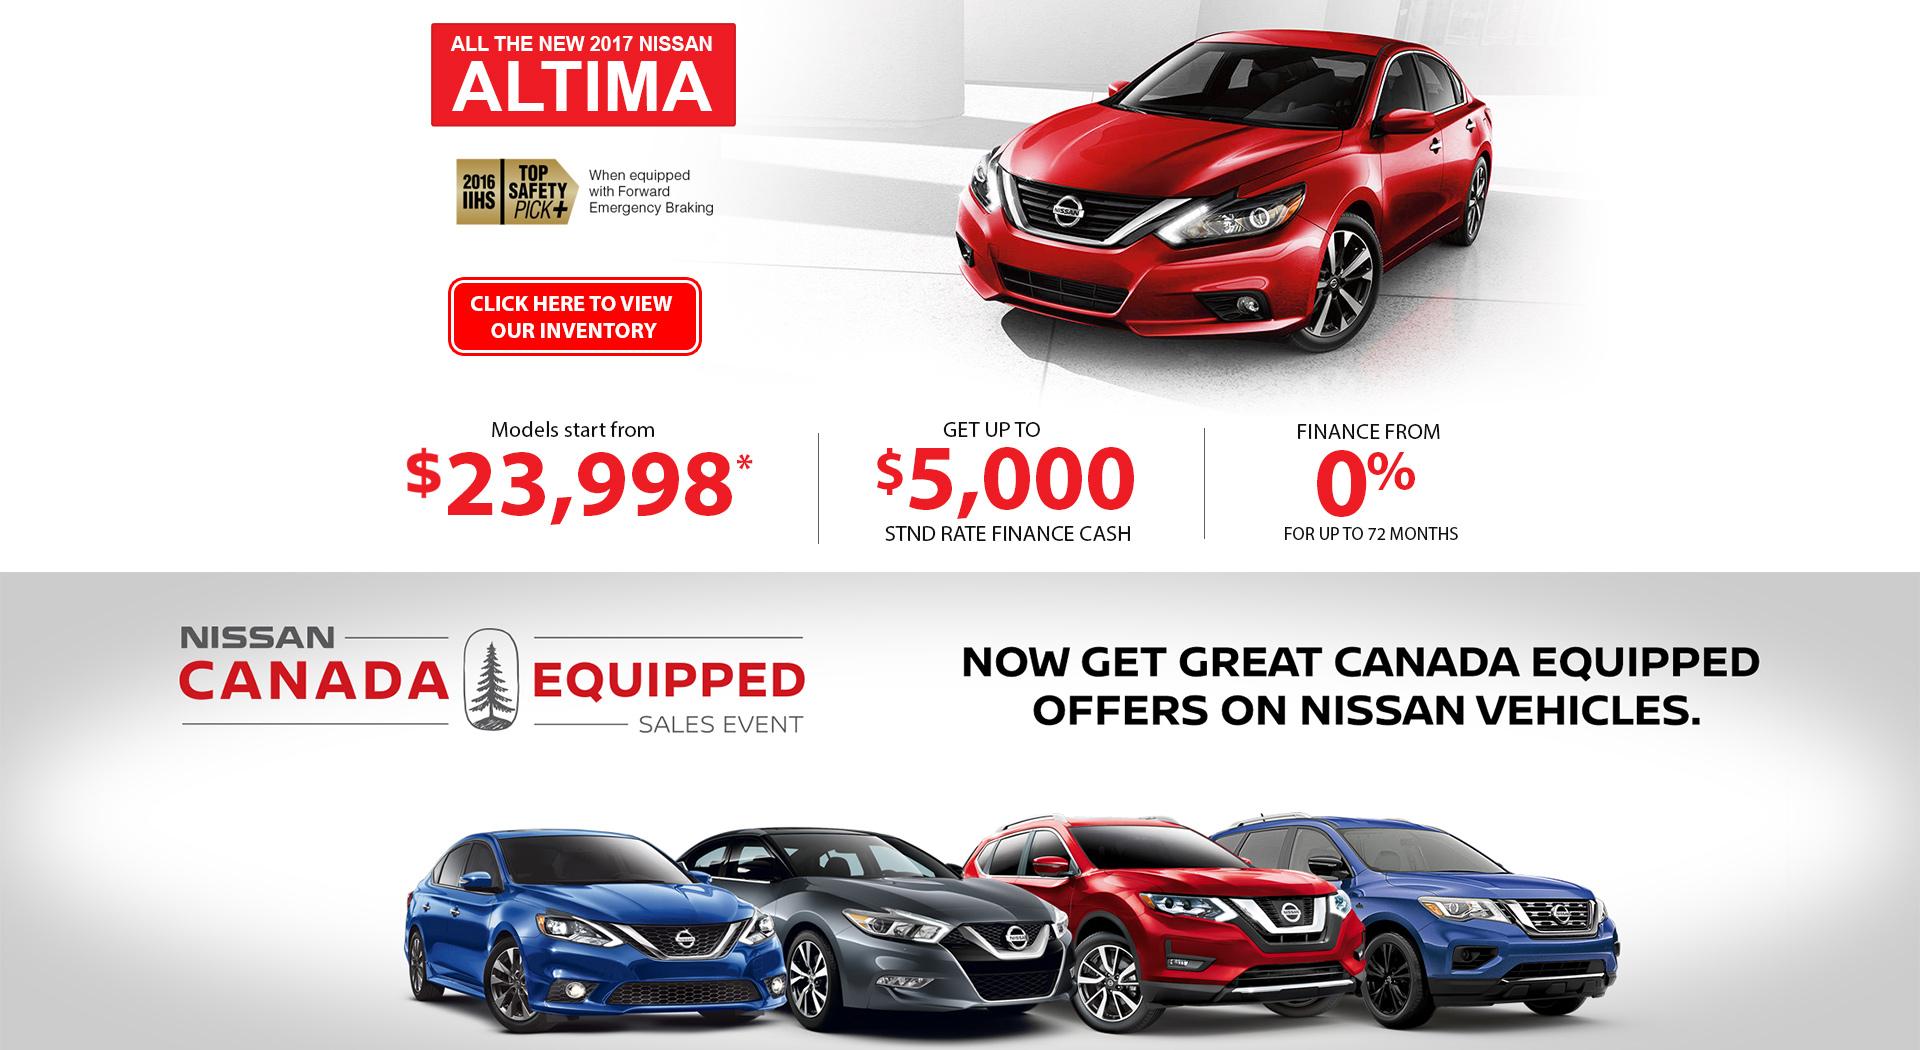 Nissan Altima: Supplemental air bag warning light